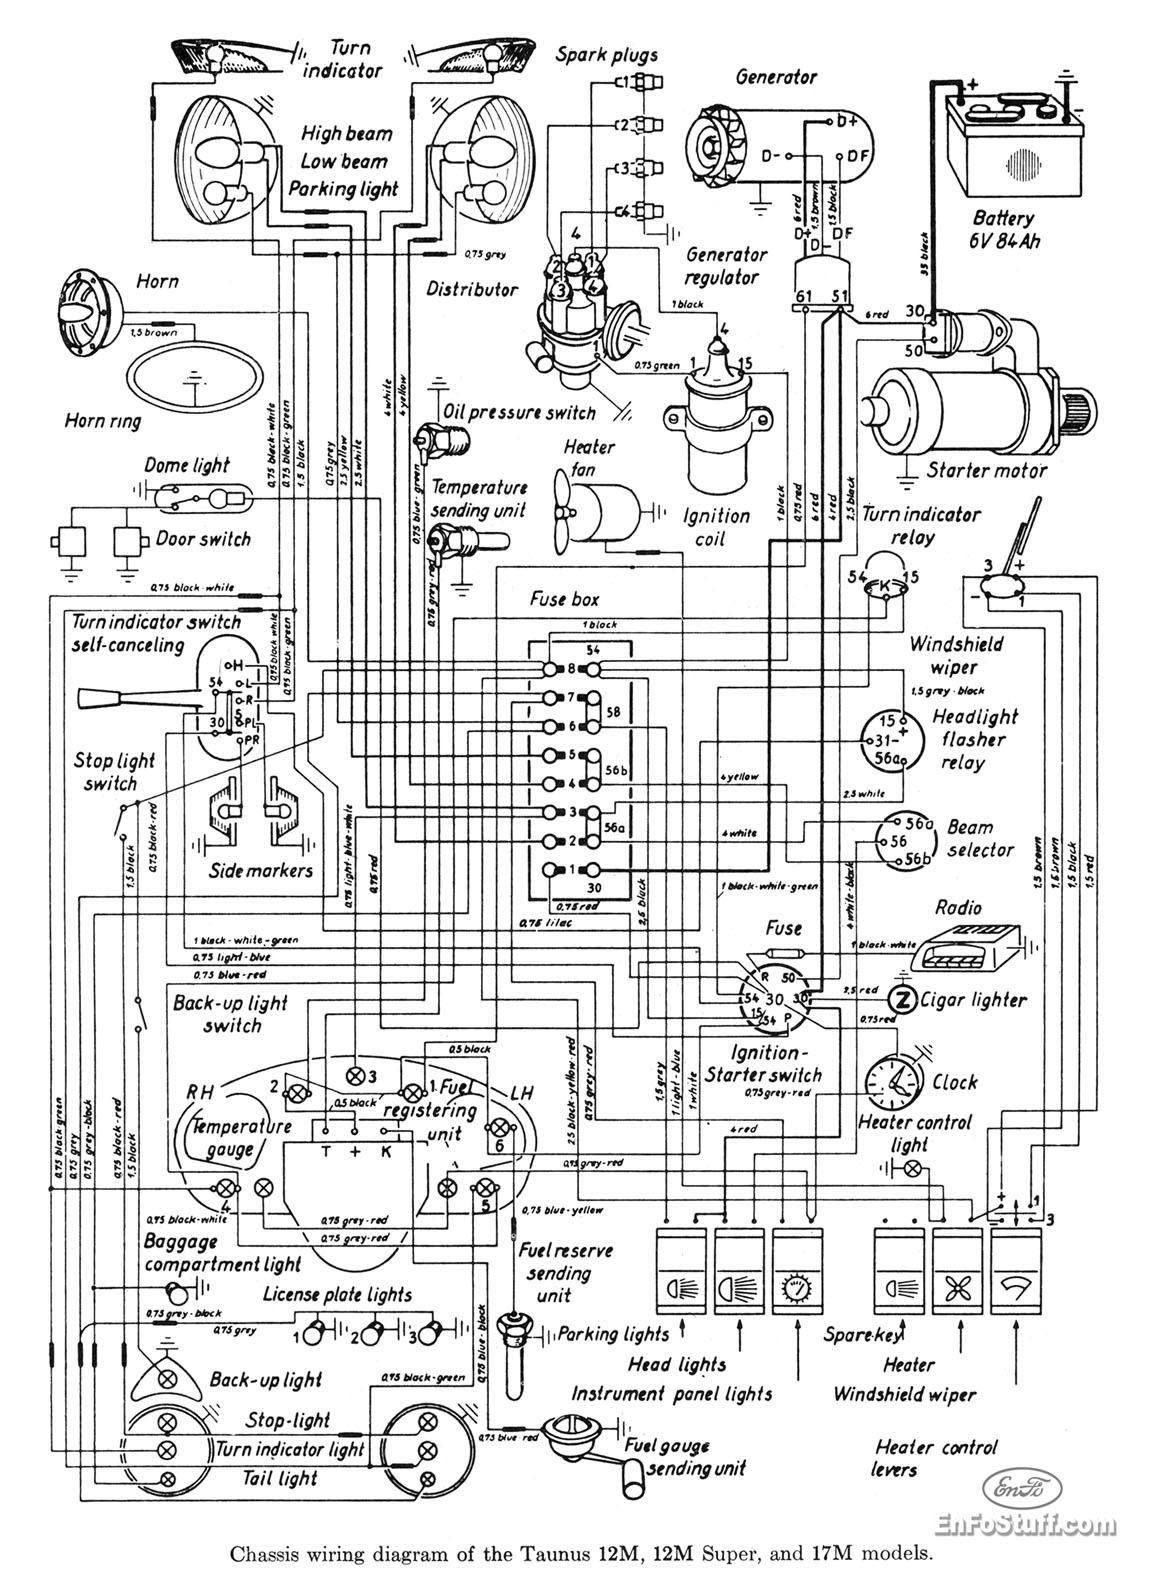 1966 impala fuse box xr 6376  wiring diagram for 1966 chevy impala wiring free engine  wiring diagram for 1966 chevy impala